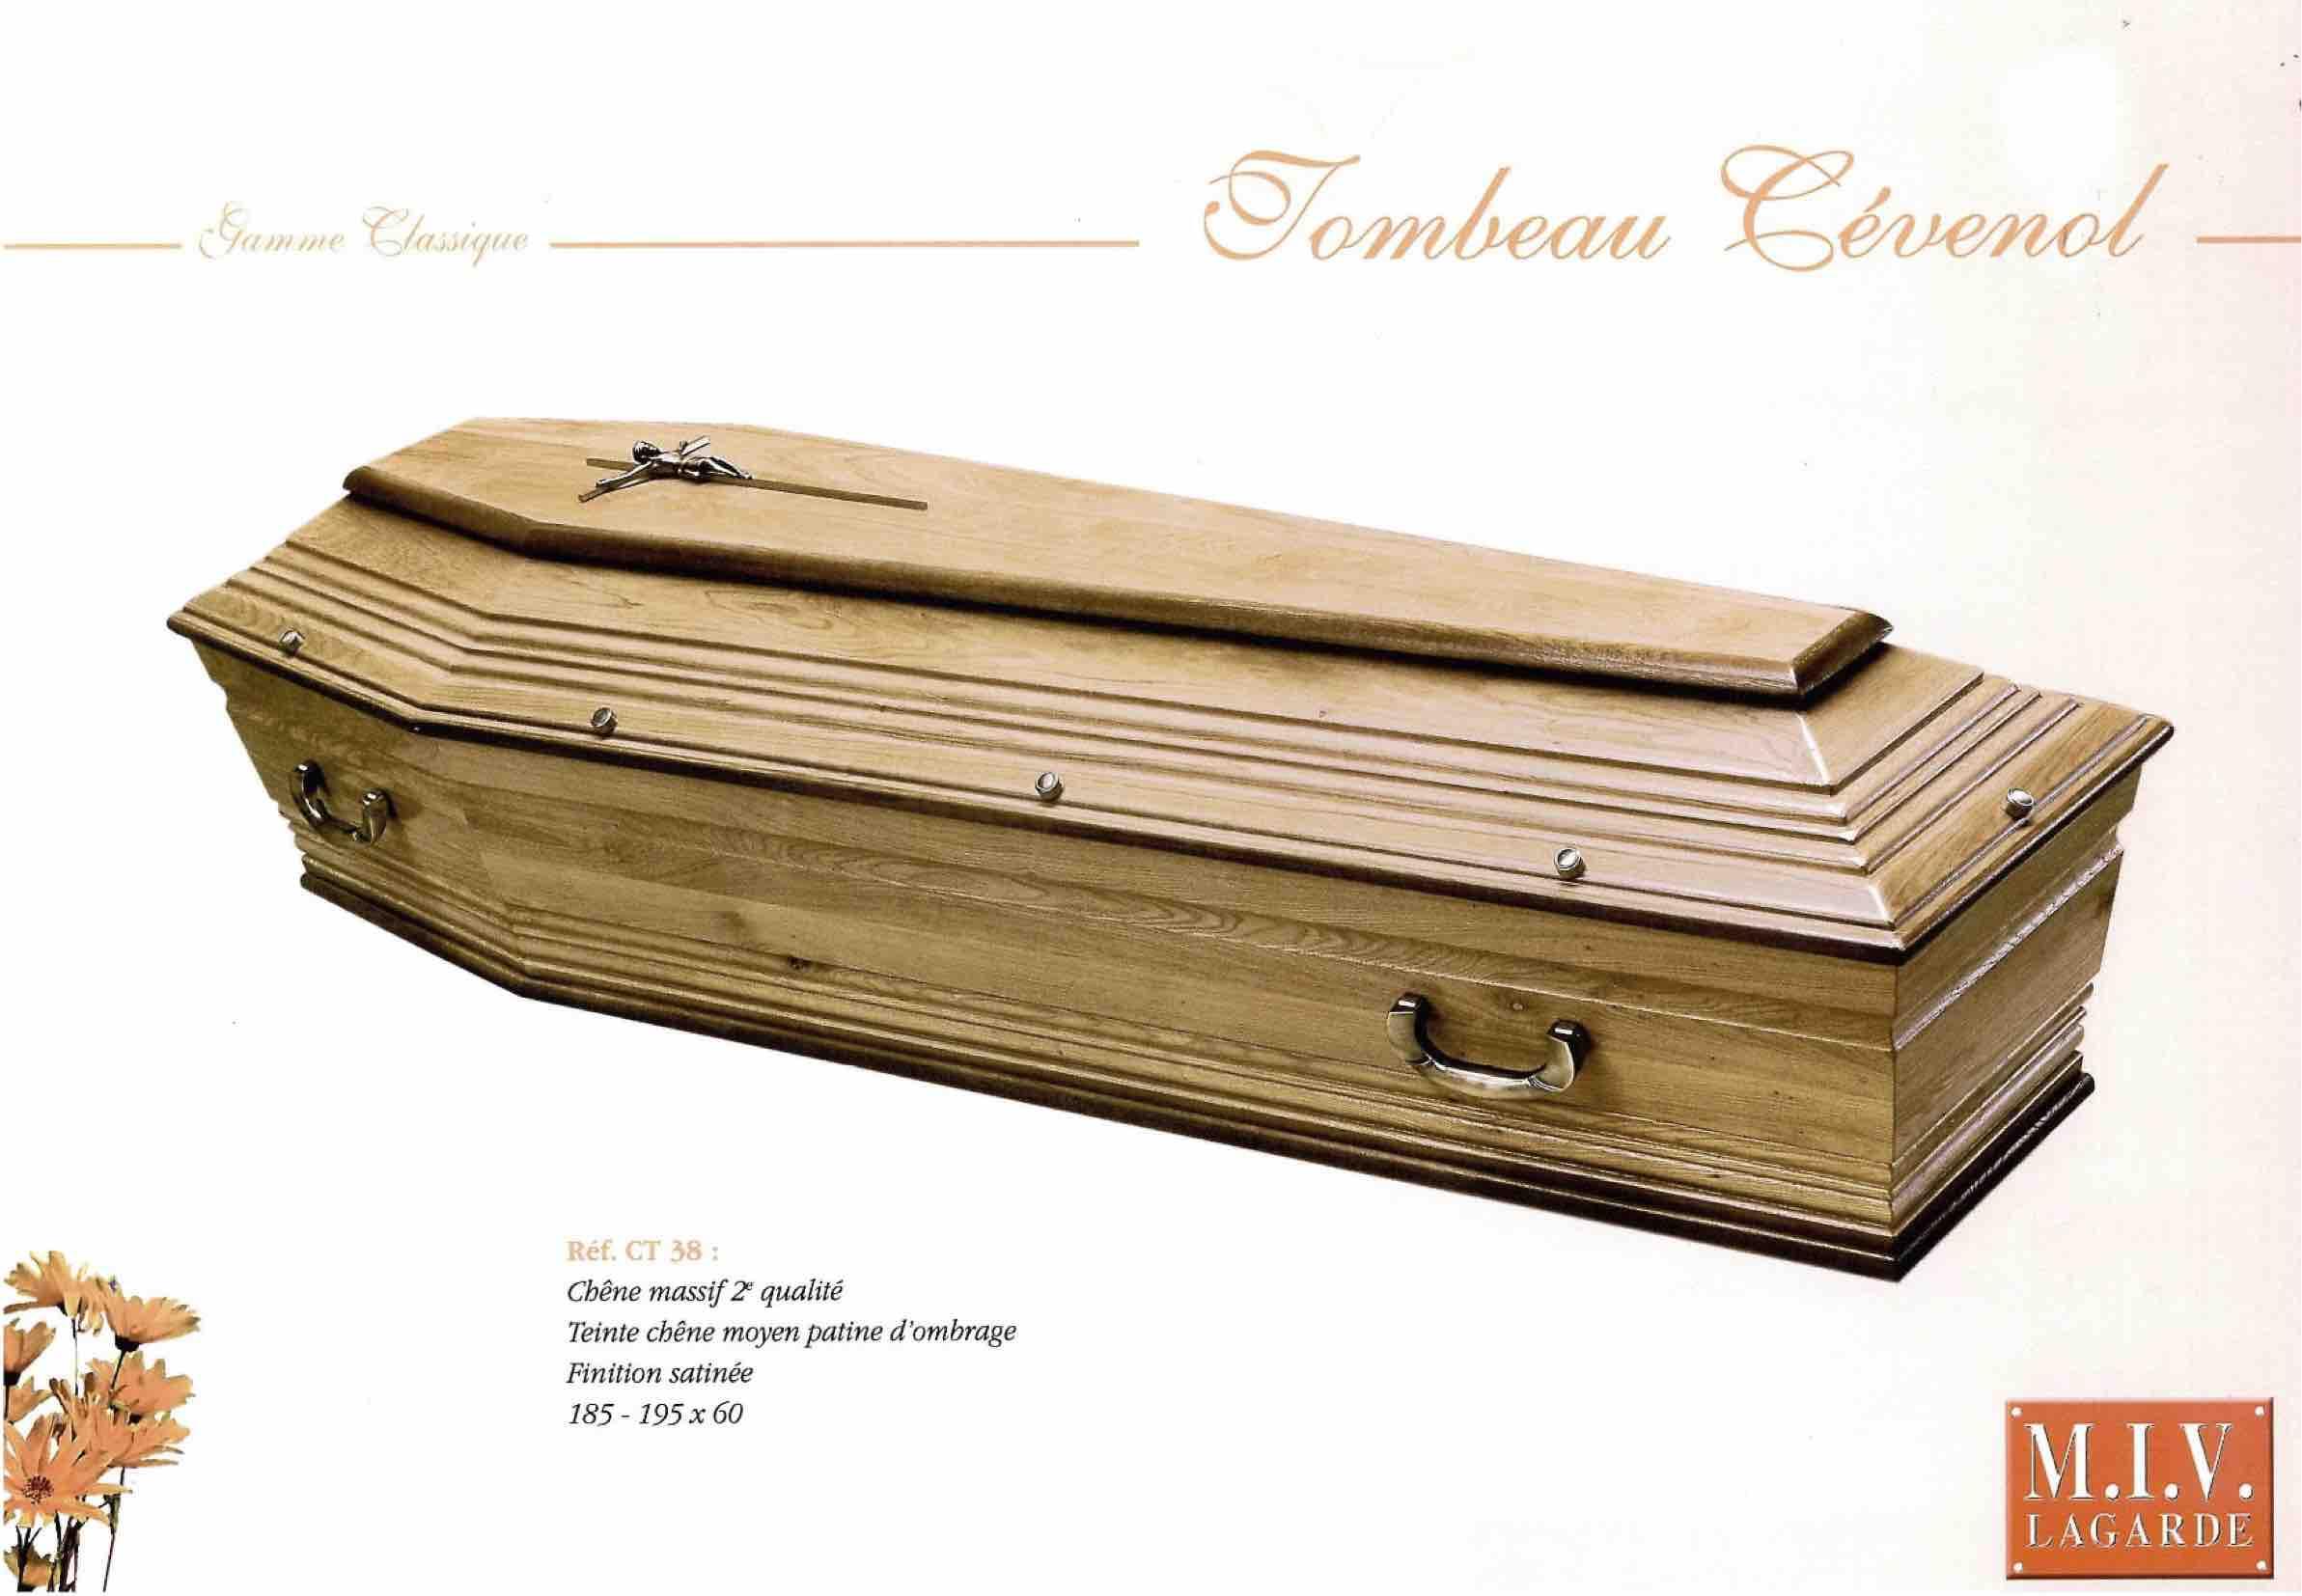 cercueil-inhumation-cévenol